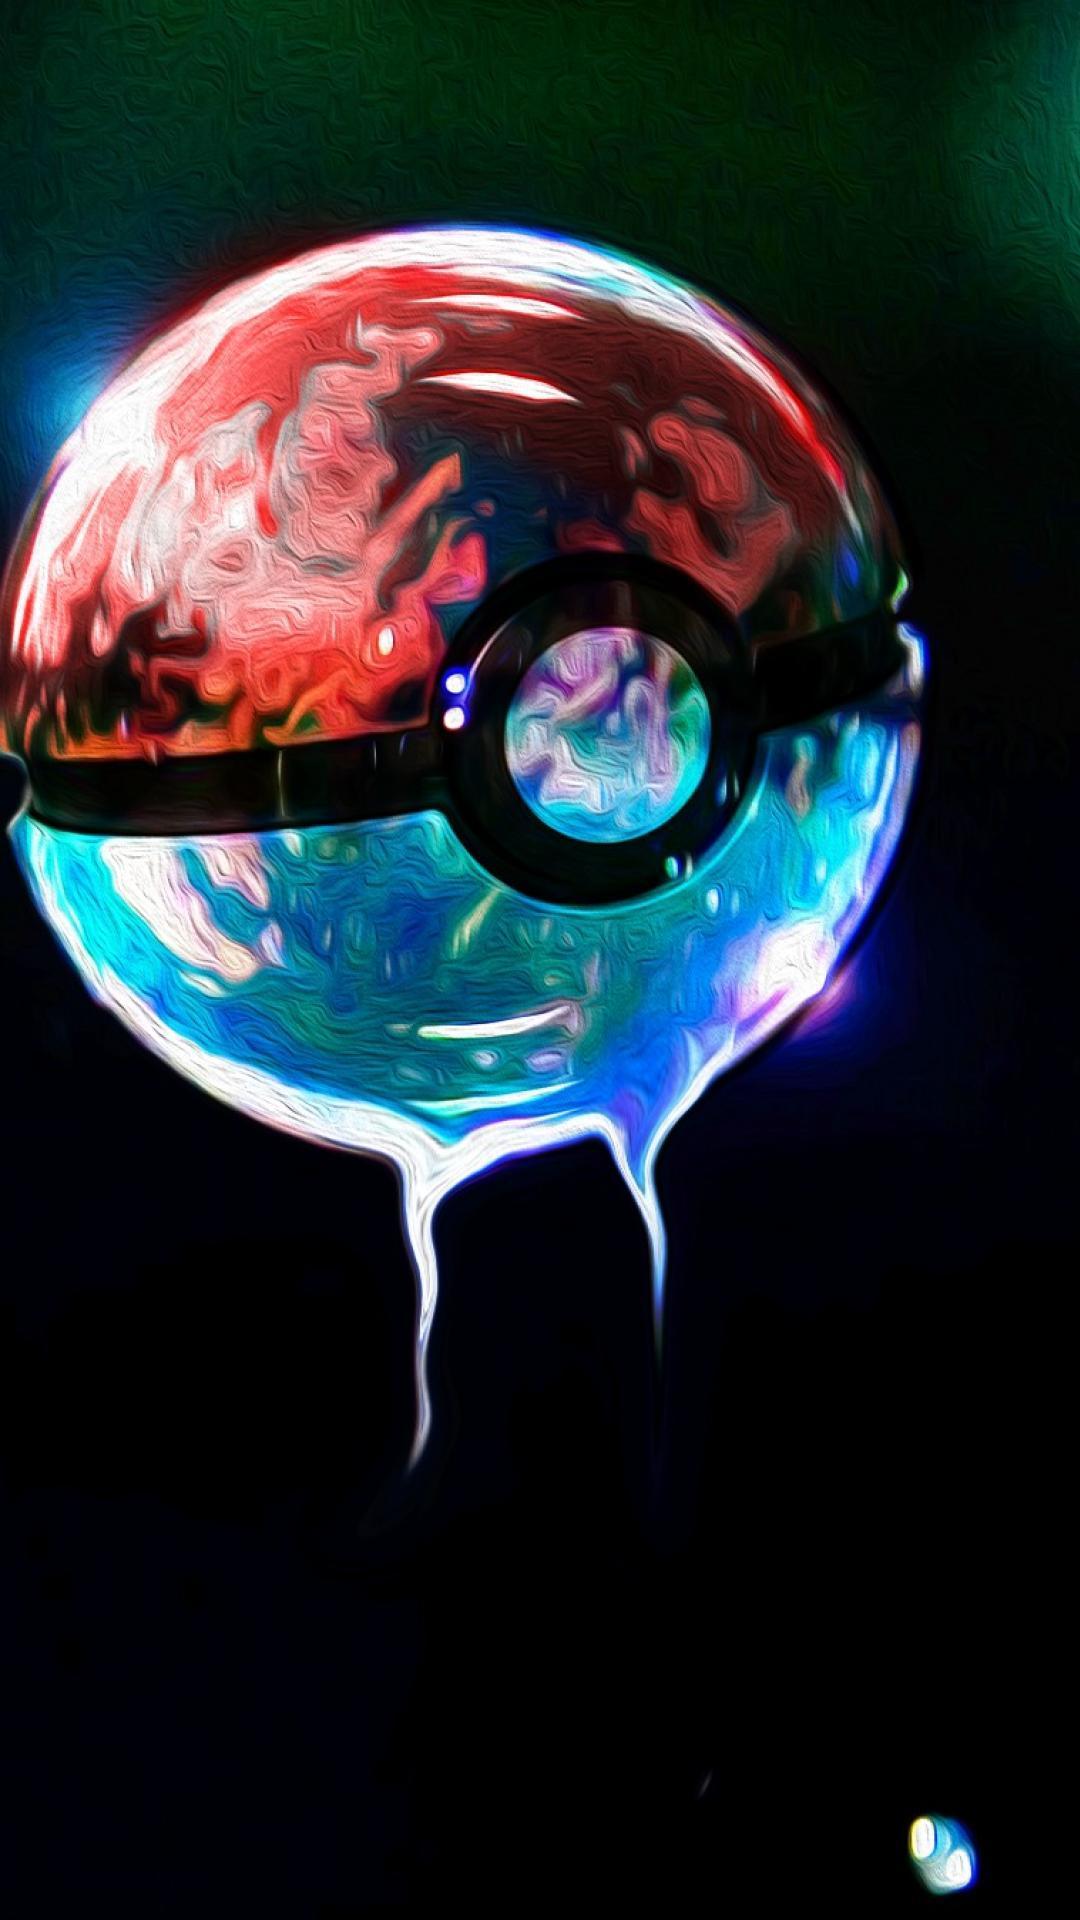 Pokémon Phone Wallpapers - Top Free Pokémon Phone ...